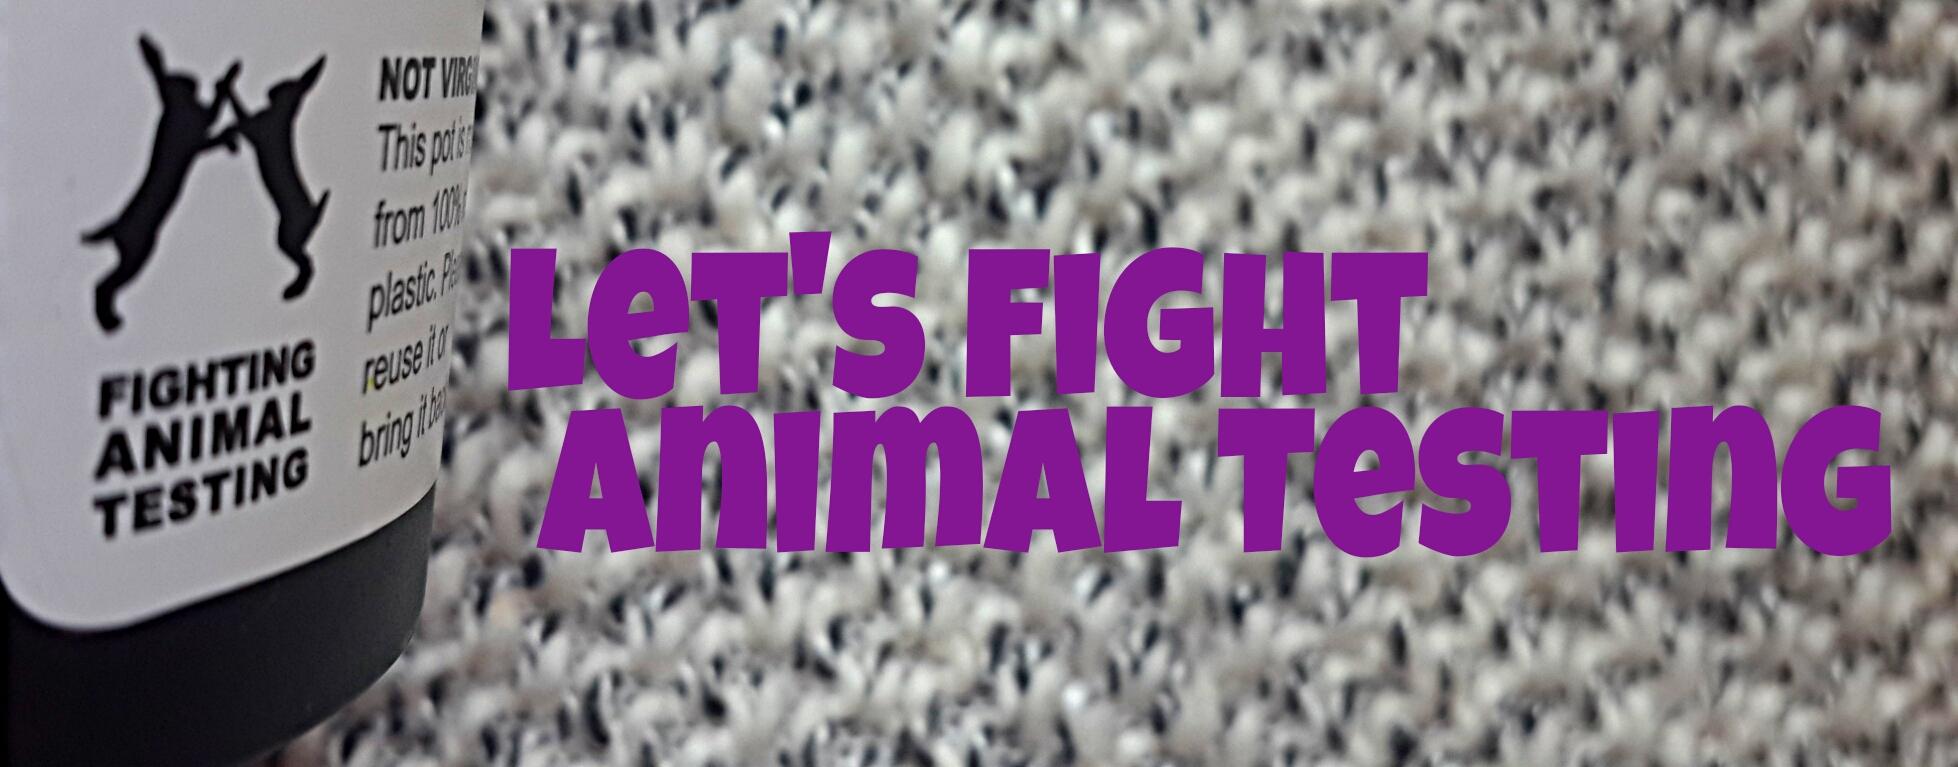 Let's Fight Animal Testing - LUSH